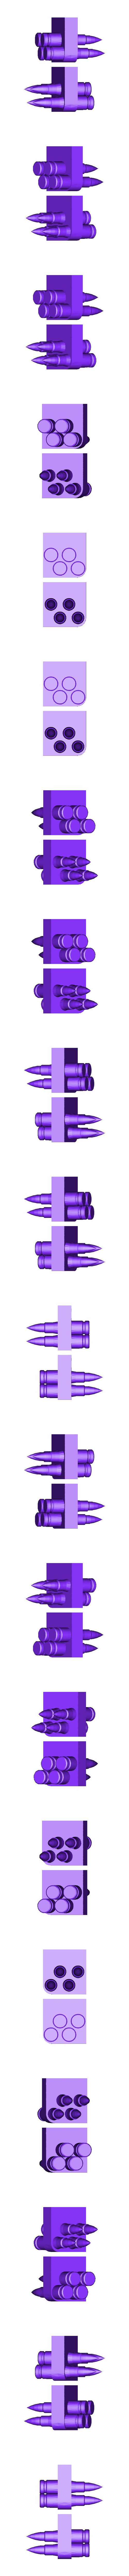 BodyT1_10_Minigun_Bullets_Gold.stl Download STL file Heavy Gun Walker • 3D print design, Jwoong